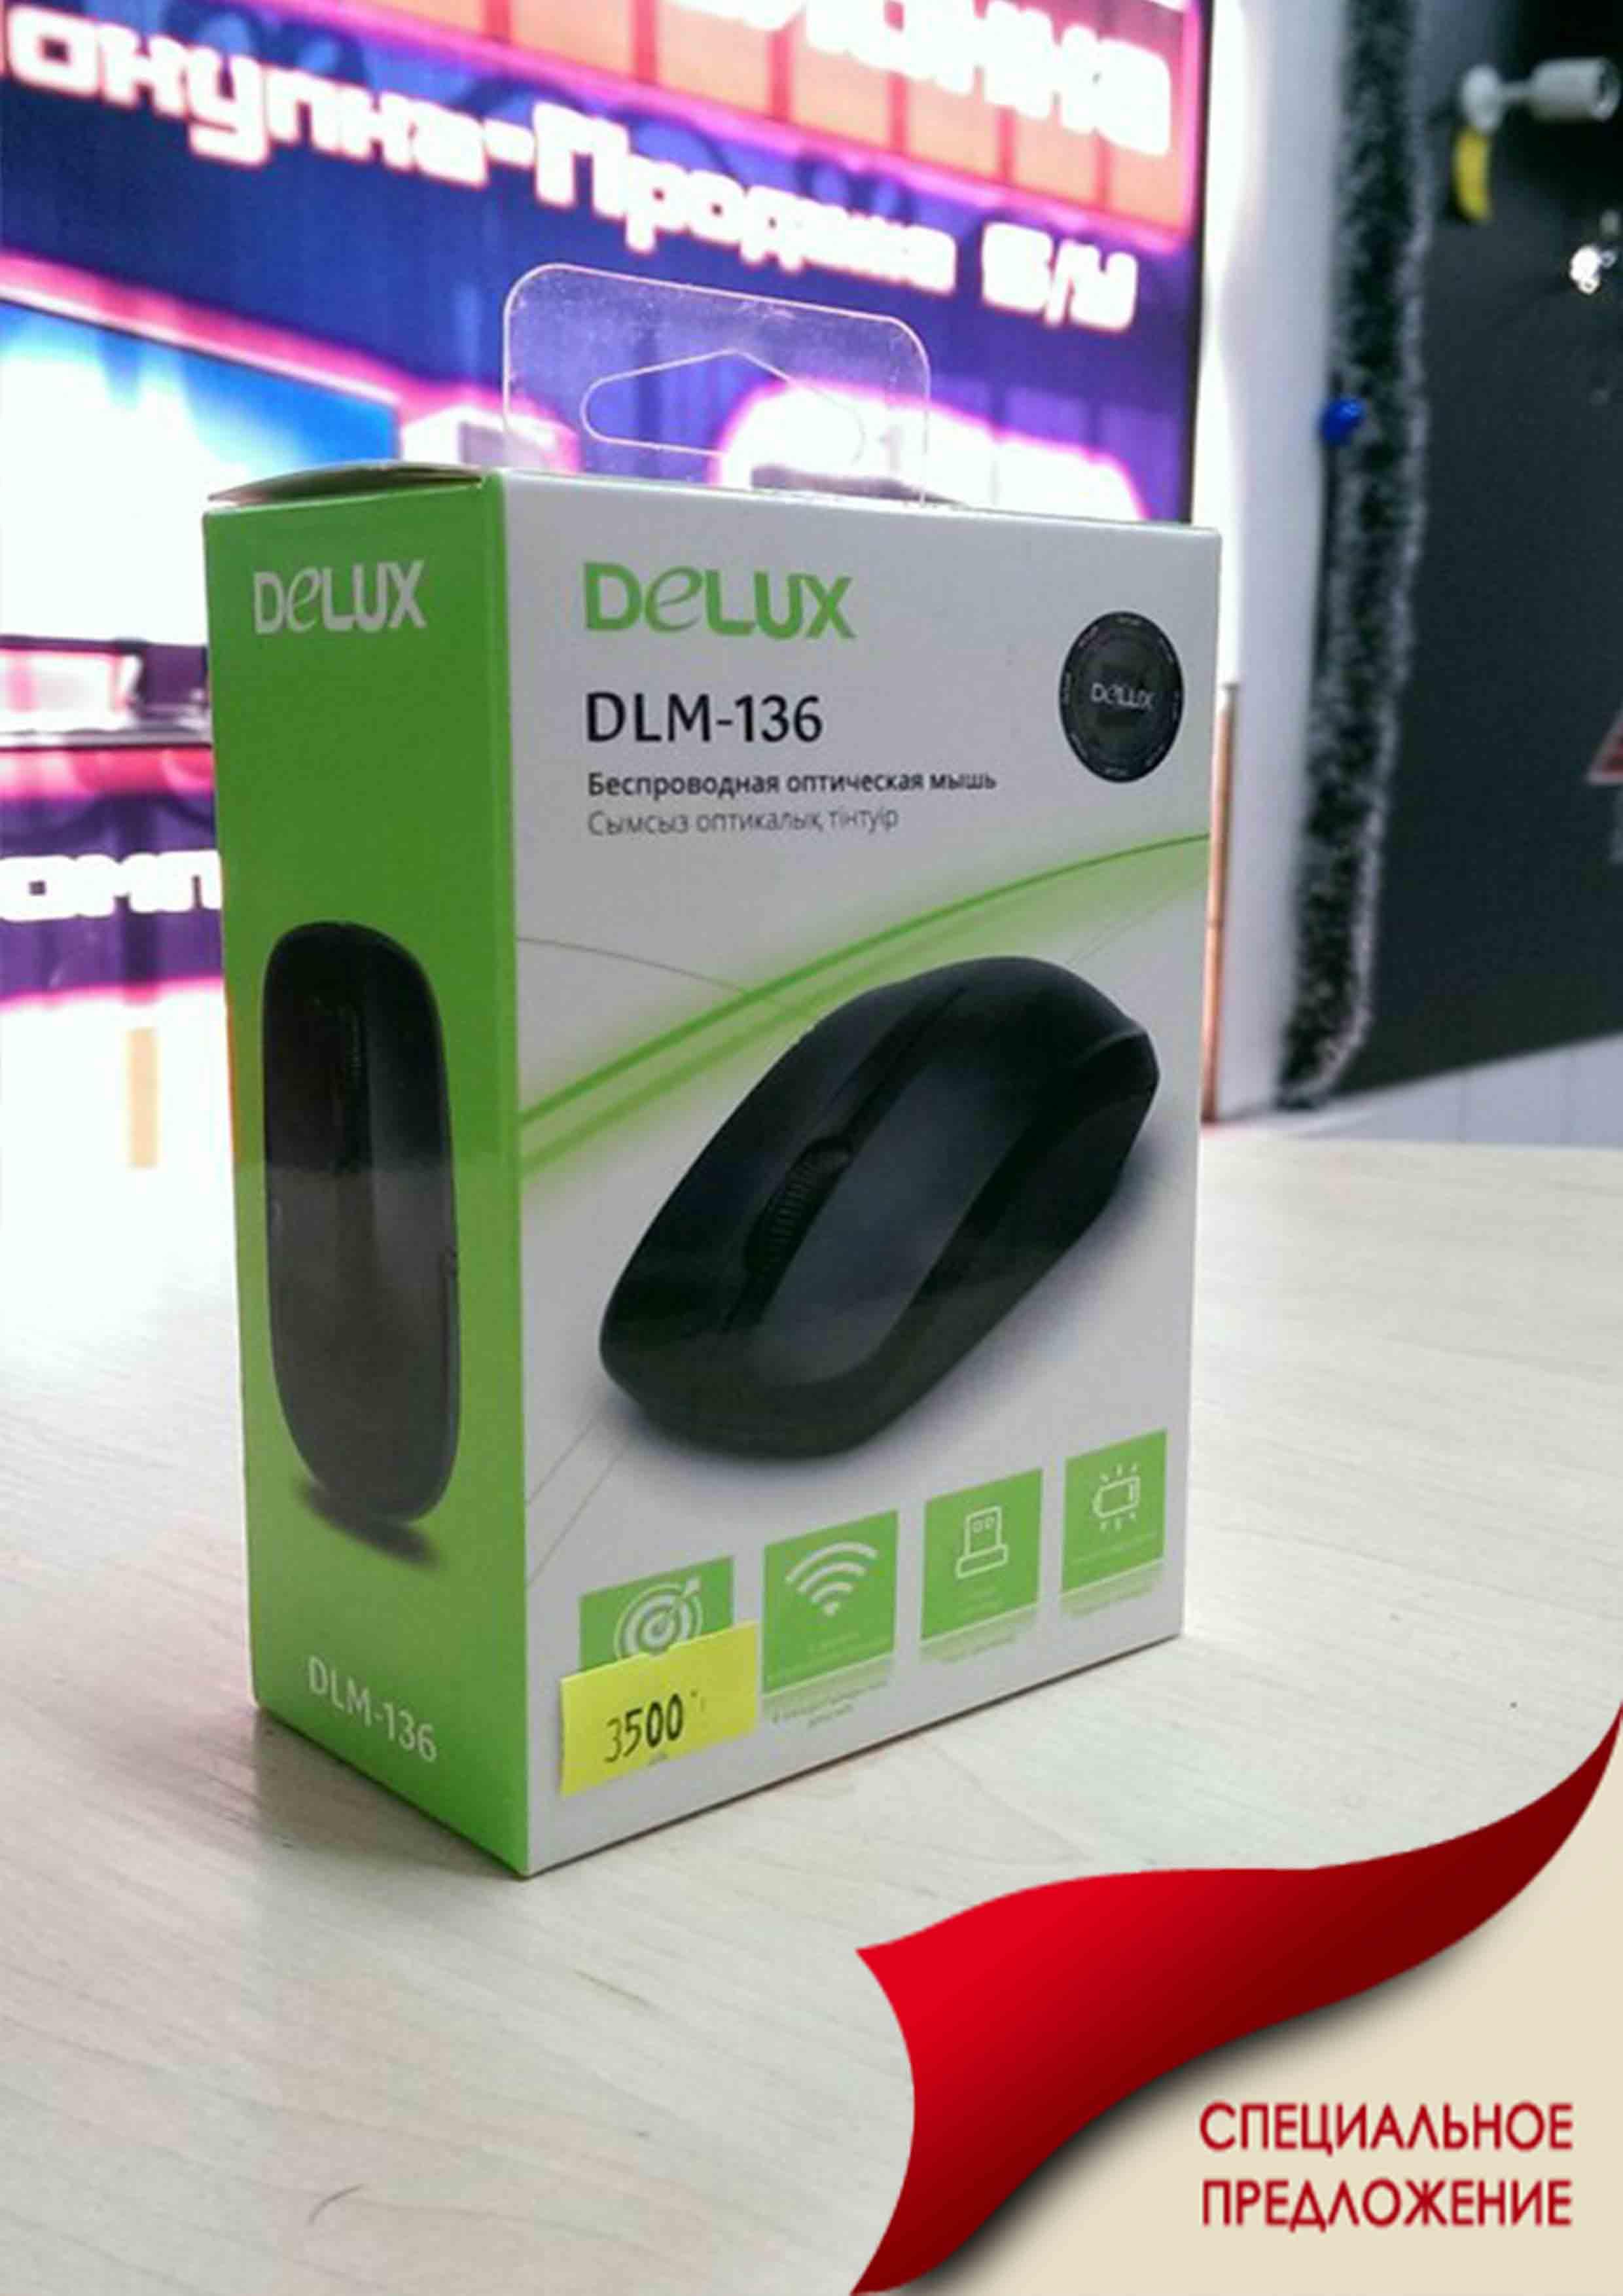 Мышка беспроводная Delux DLM-136